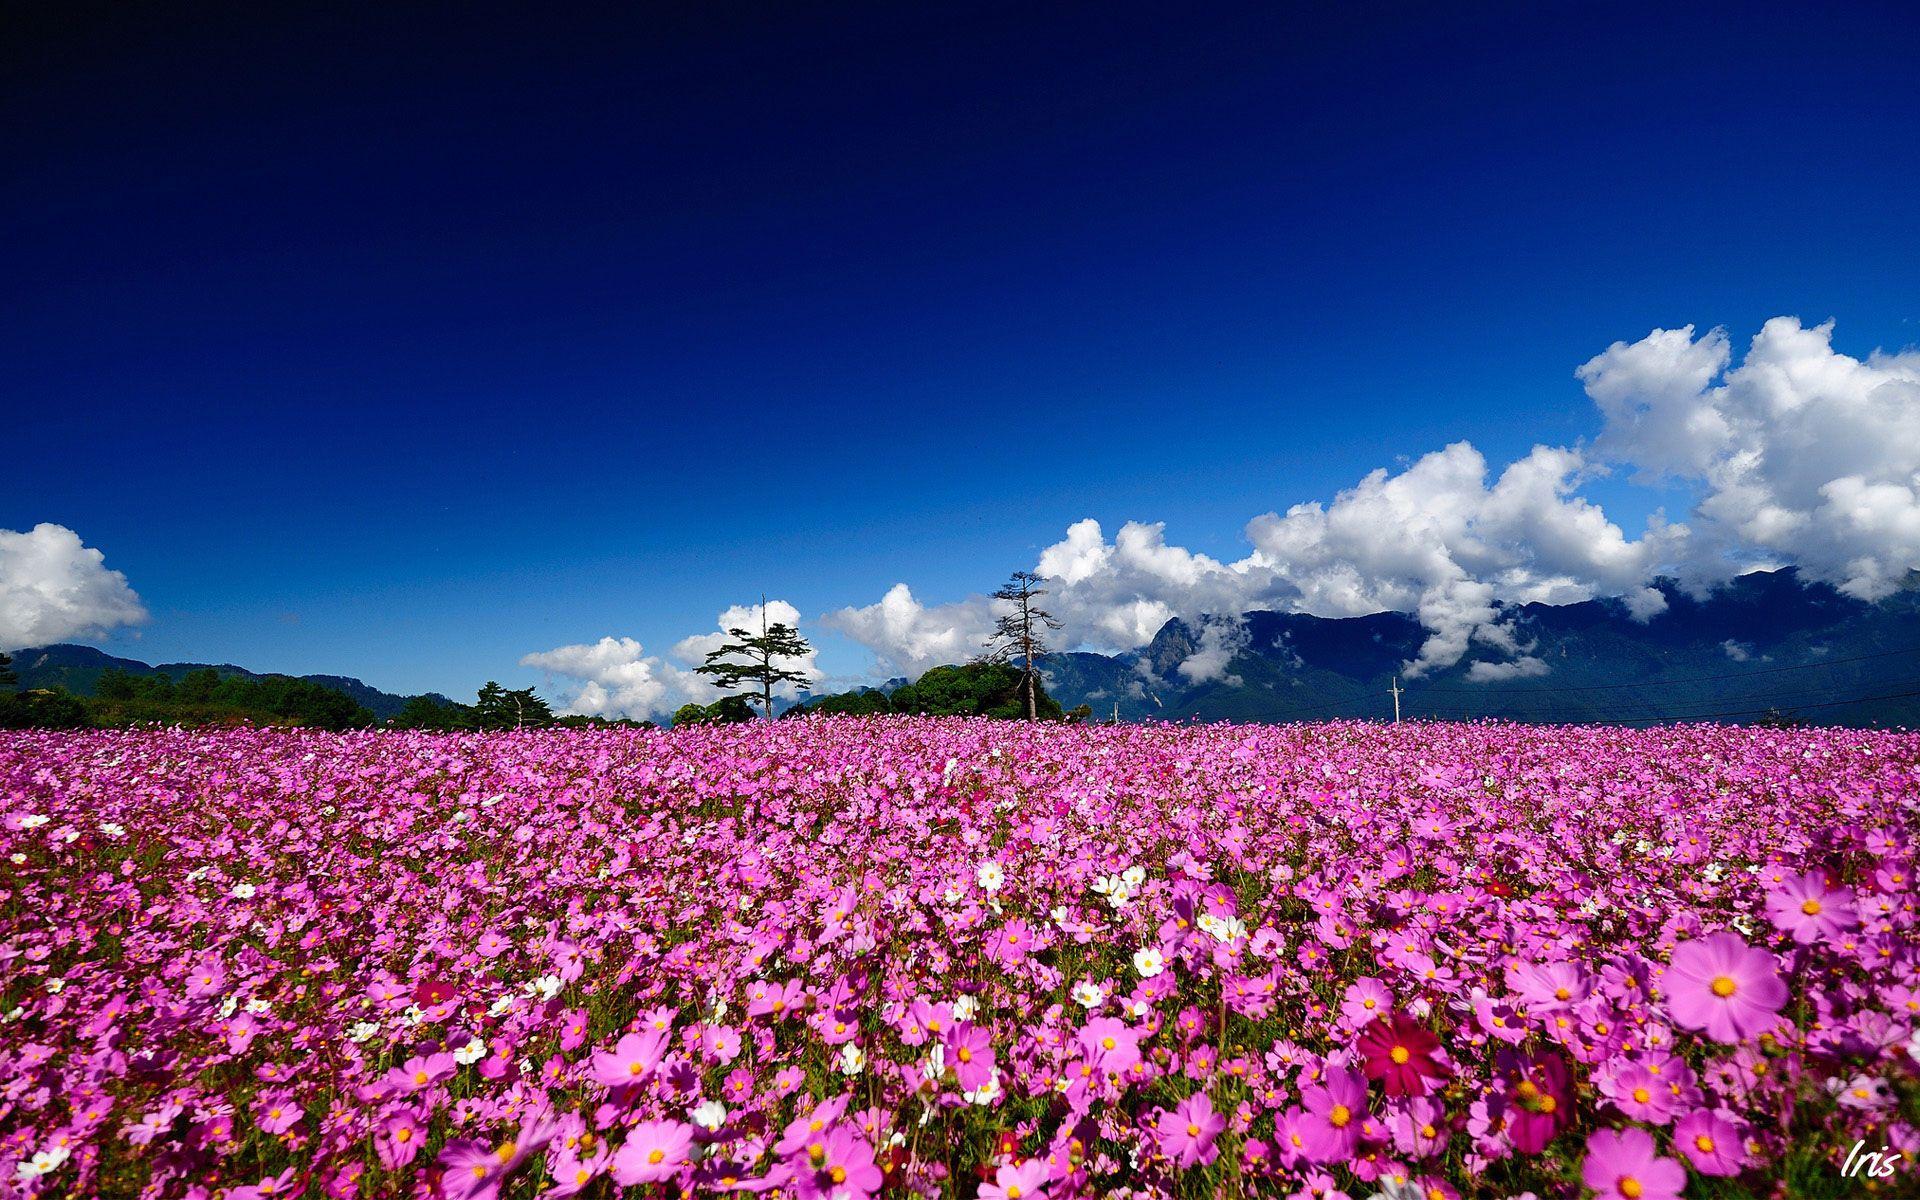 Flower Field Wallpapers | Best Wallpapers | Beautiful Wallpapers ...